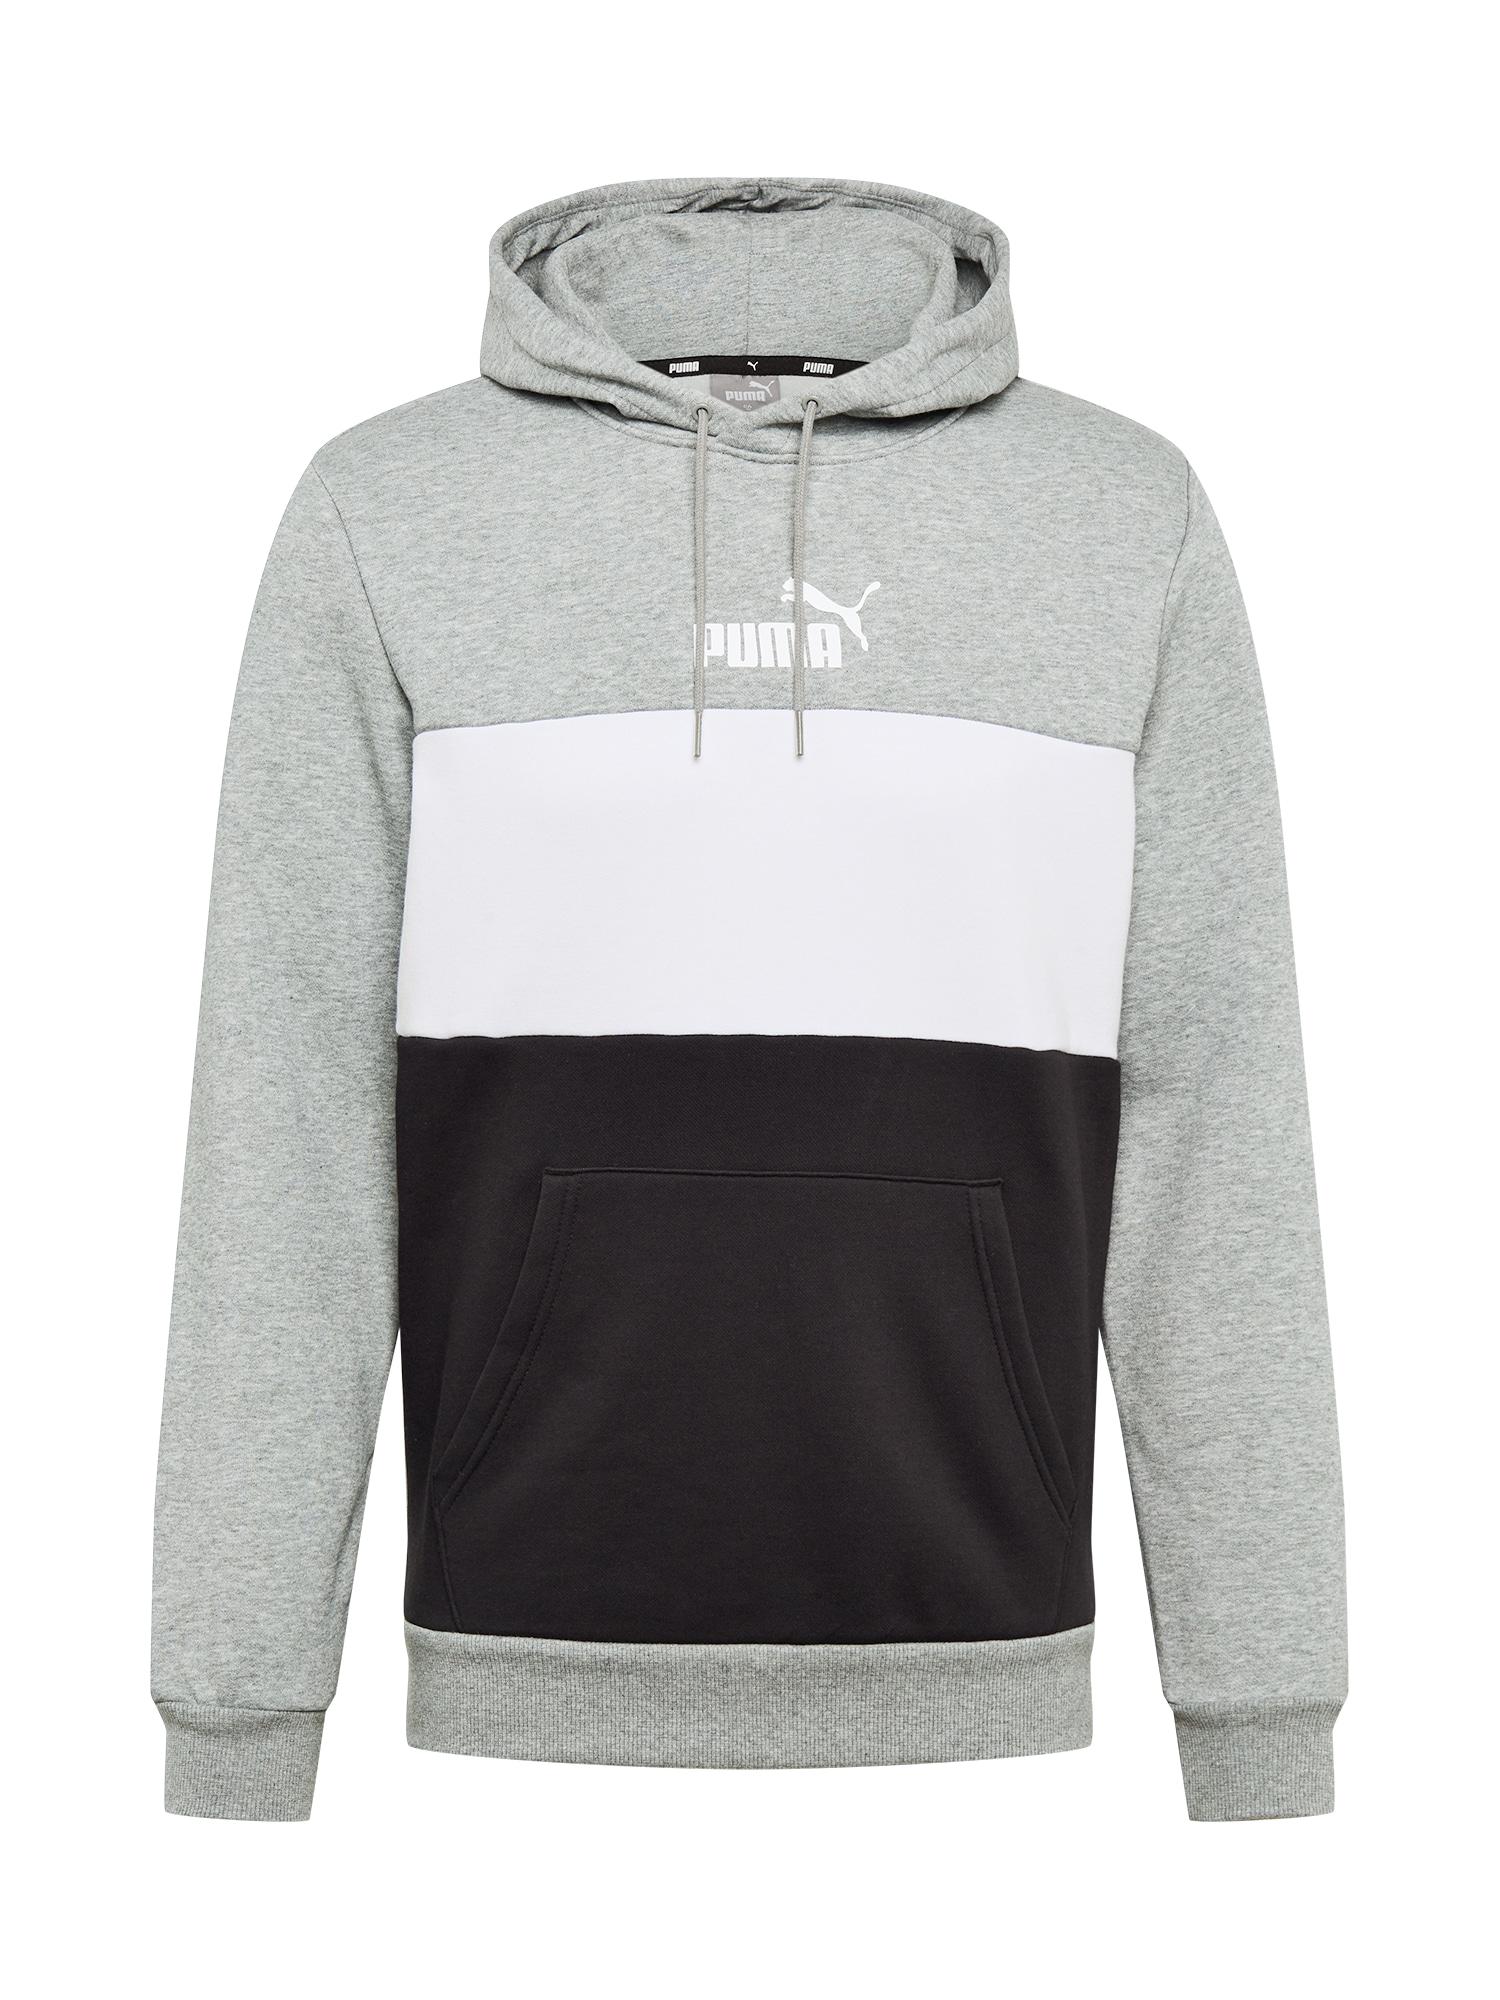 PUMA Sportinio tipo megztinis margai pilka / juoda / balta